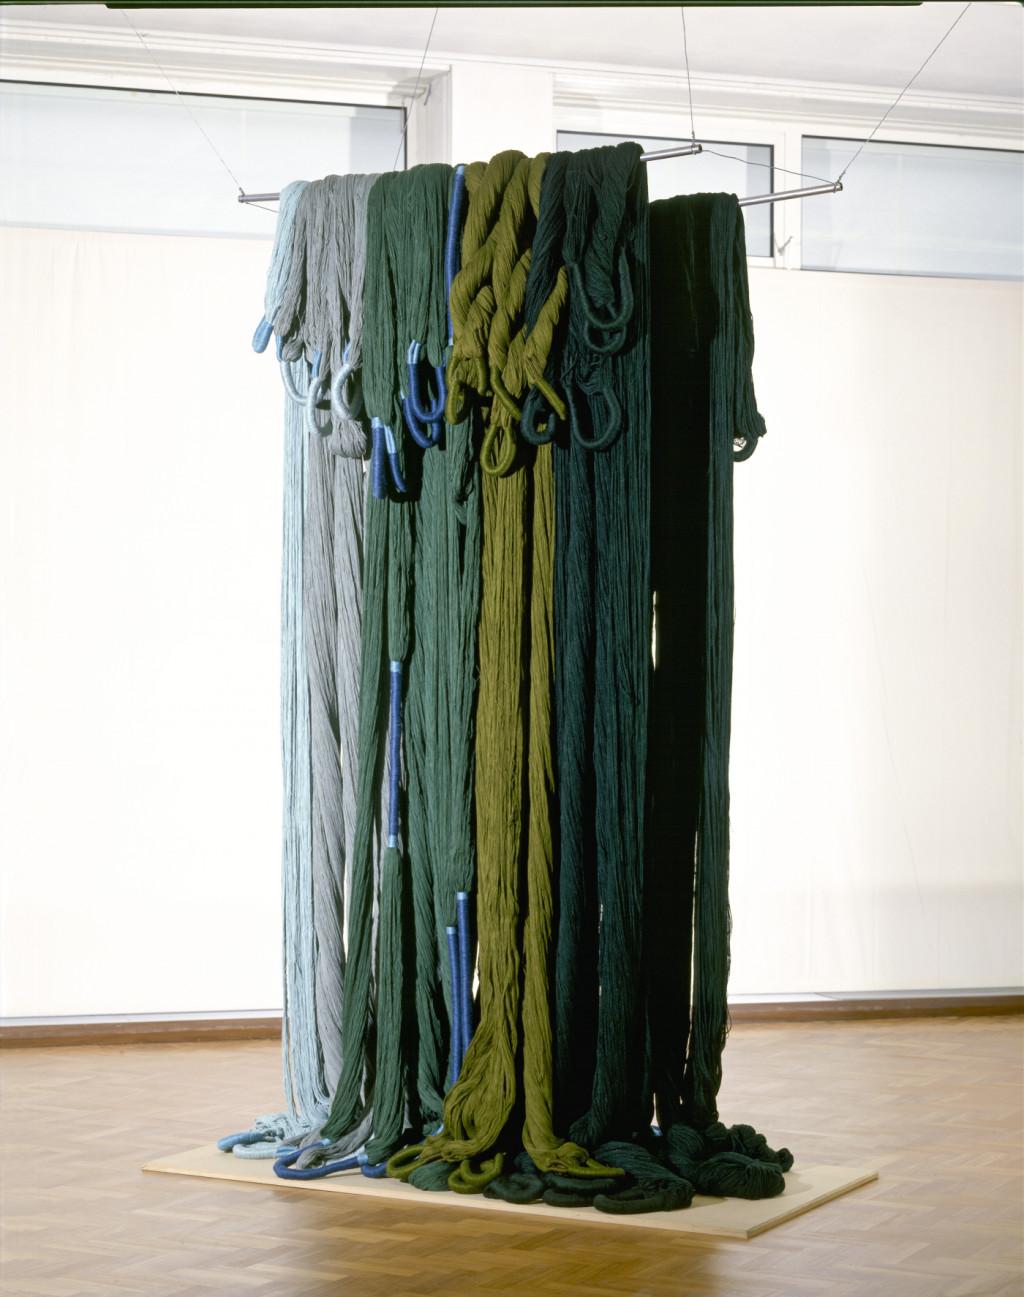 Sheila Hicks, Vague Verte, 1974. Collectie Stedelijk Museum Amsterdam.